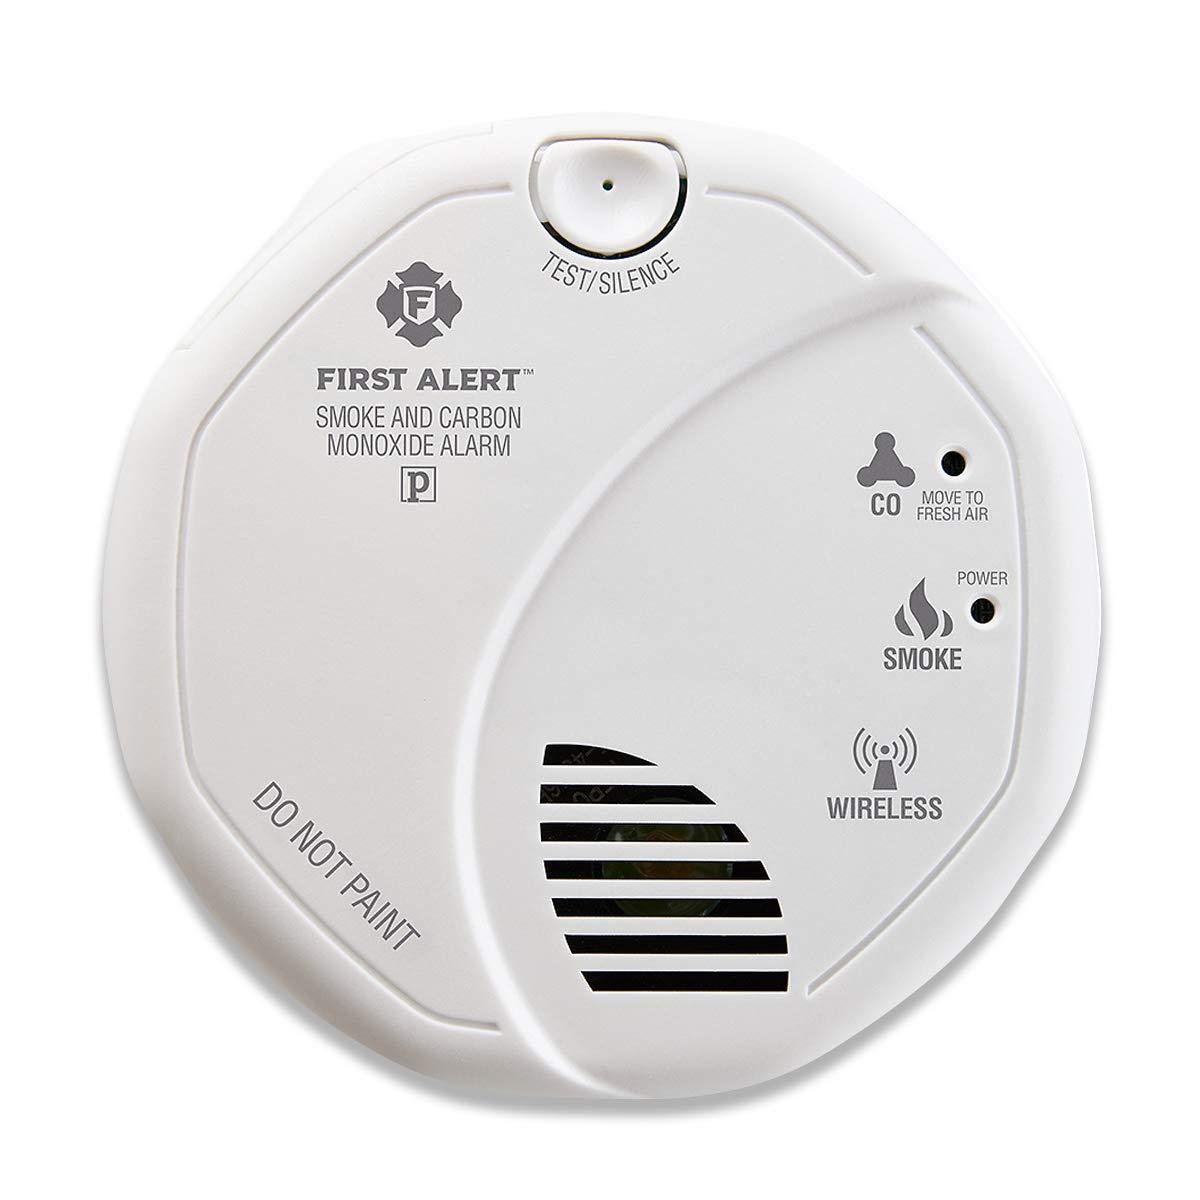 First Alert 2-in-1 Z-Wave Smoke Detector & Carbon Monoxide Alarm